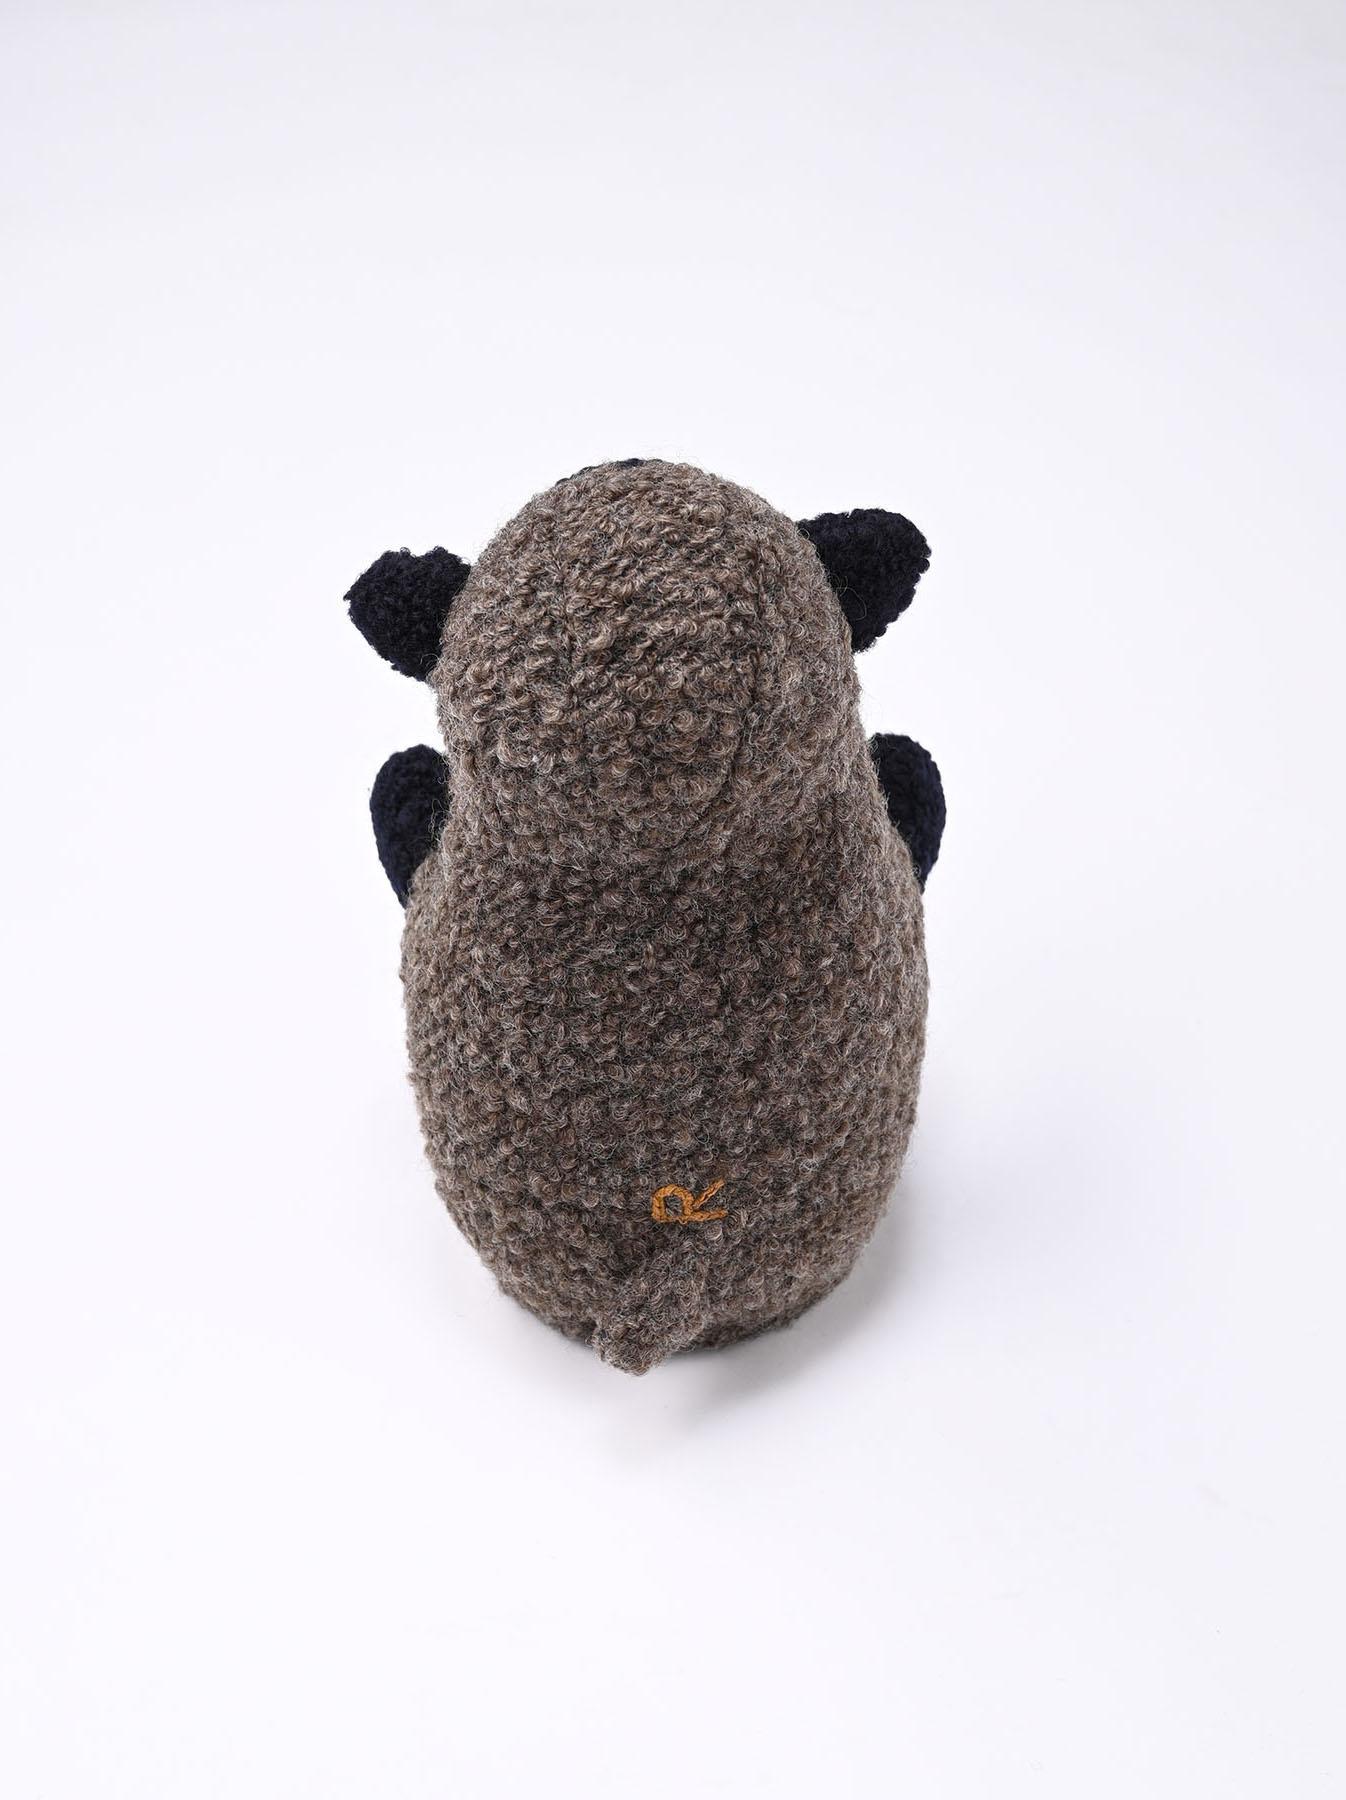 Stuffed Toy Sheep-5